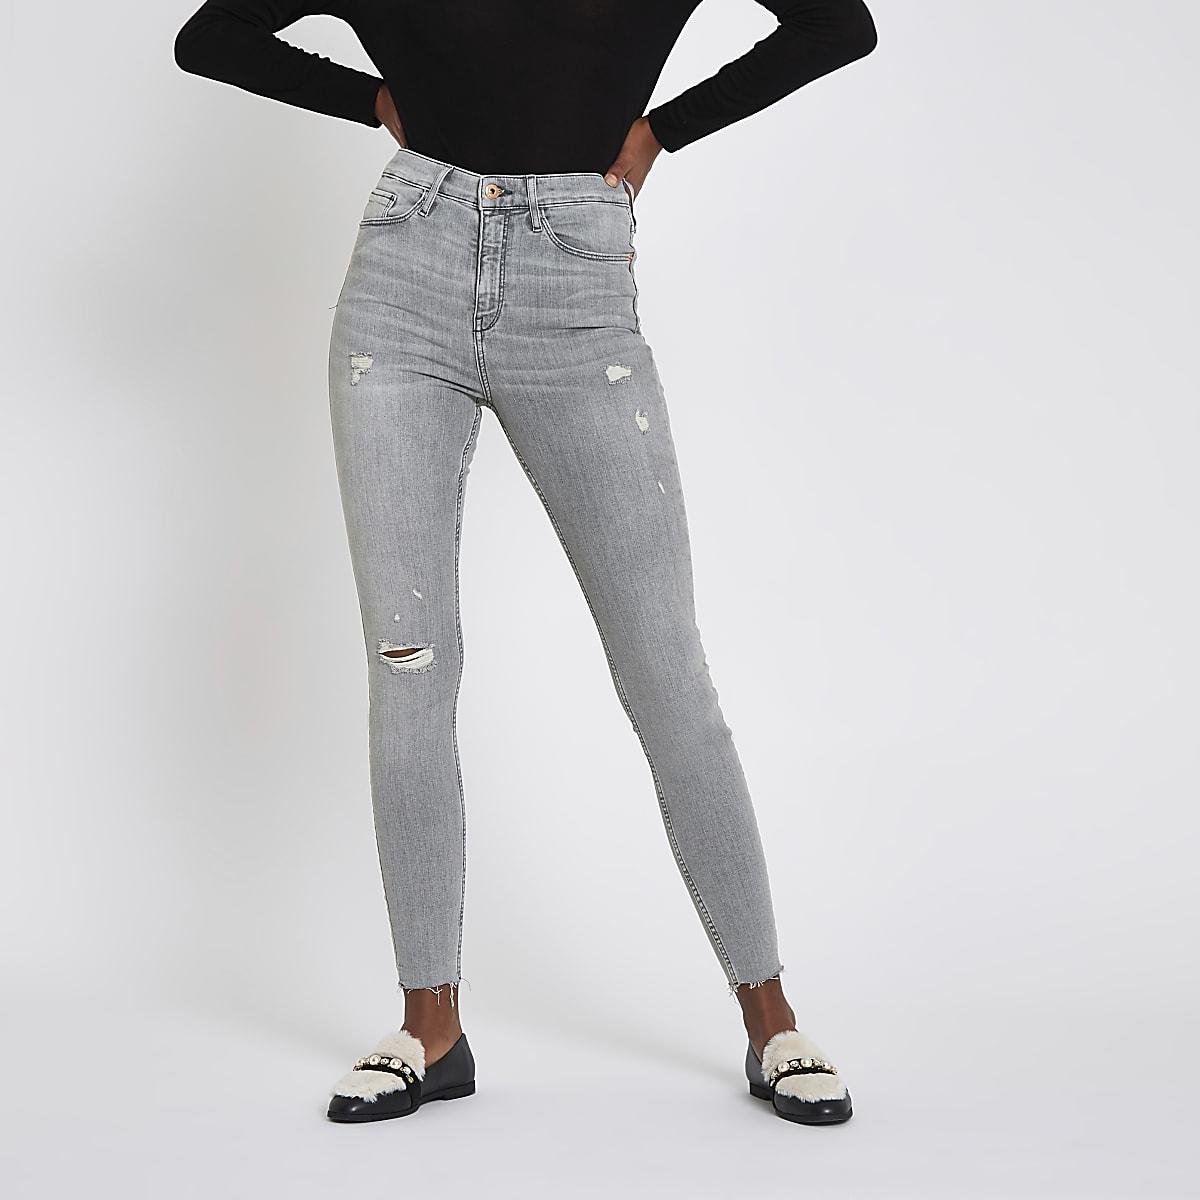 Harper – Jean super skinny gris déchiré